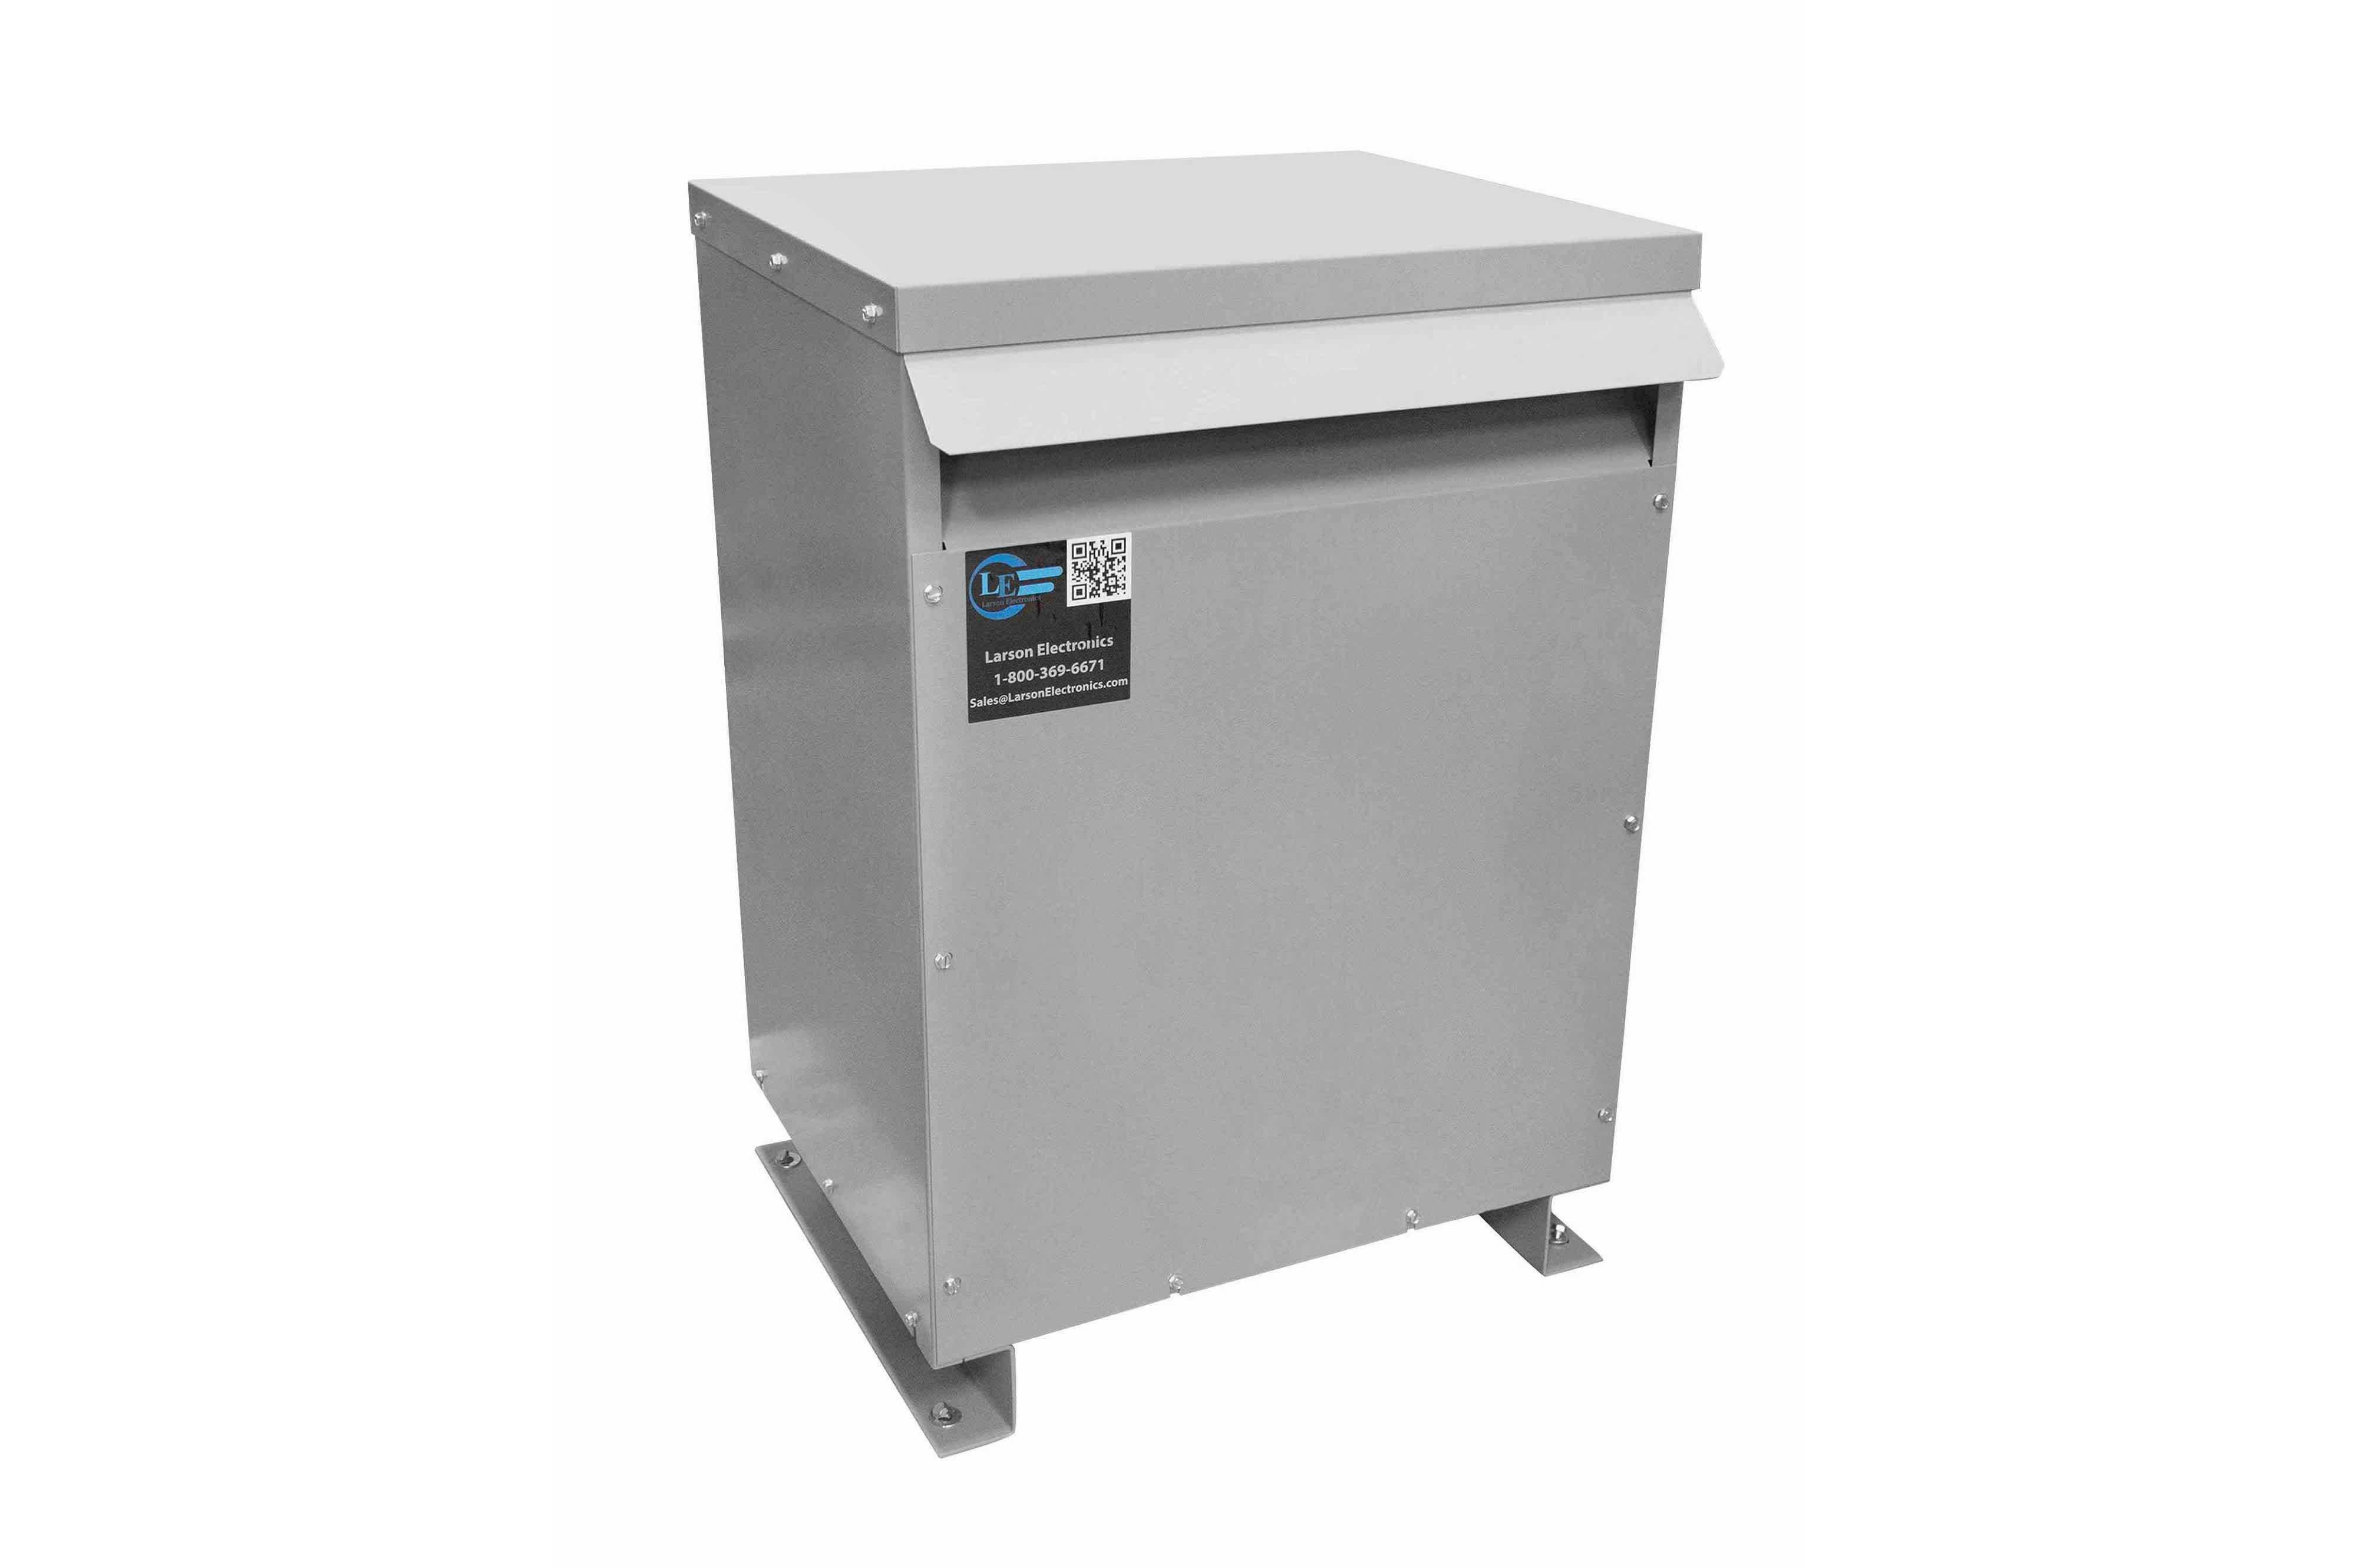 90 kVA 3PH Isolation Transformer, 208V Wye Primary, 240V Delta Secondary, N3R, Ventilated, 60 Hz